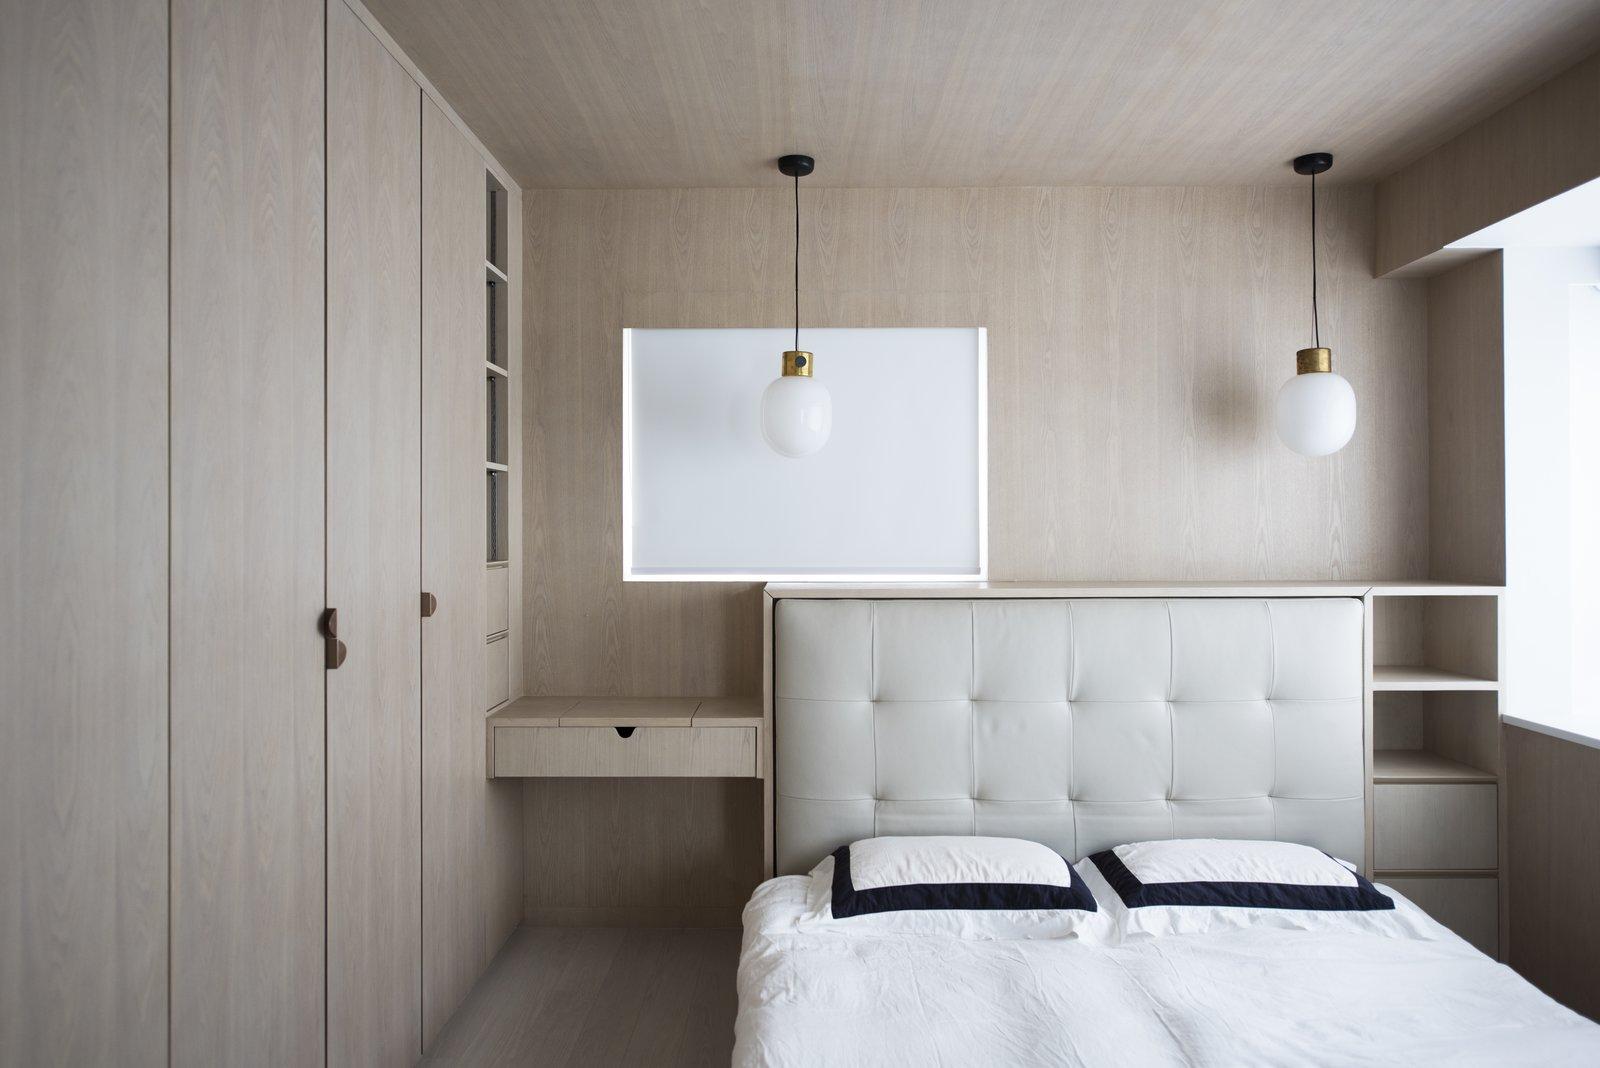 Bean Buro Urban Cocoon bedroom